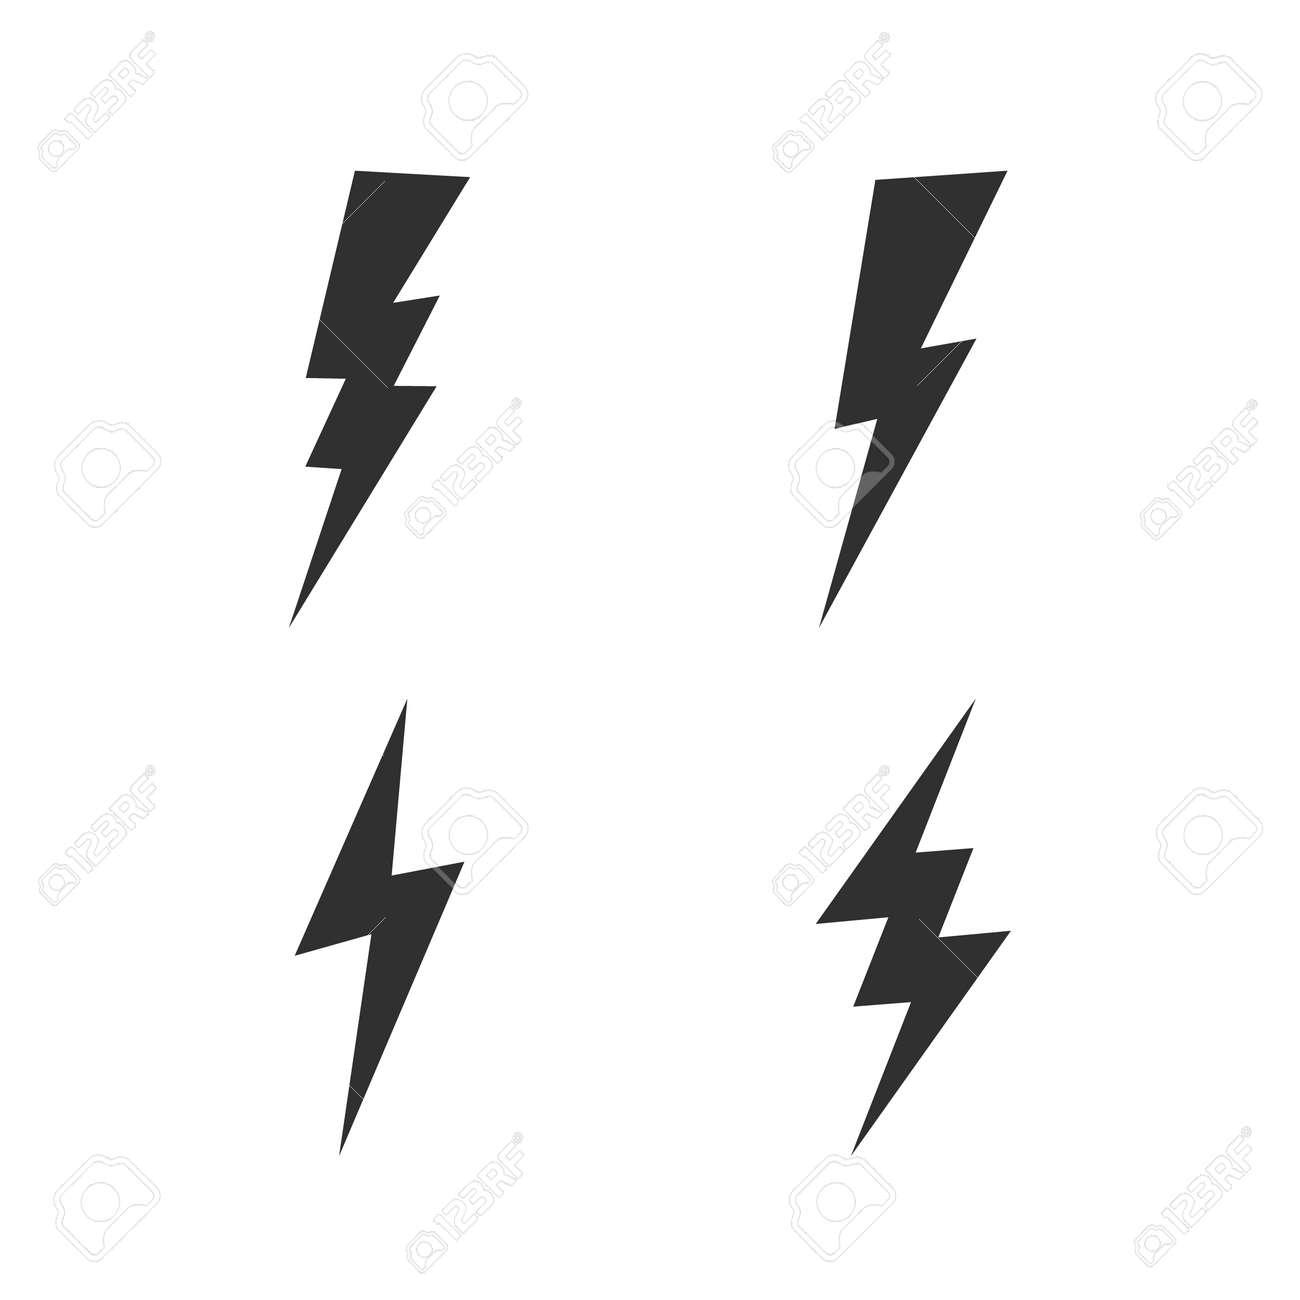 Lightning bolt icons set. Thunderbolt, lightning strike icon isolated on white background. Vector illustration - 158436932